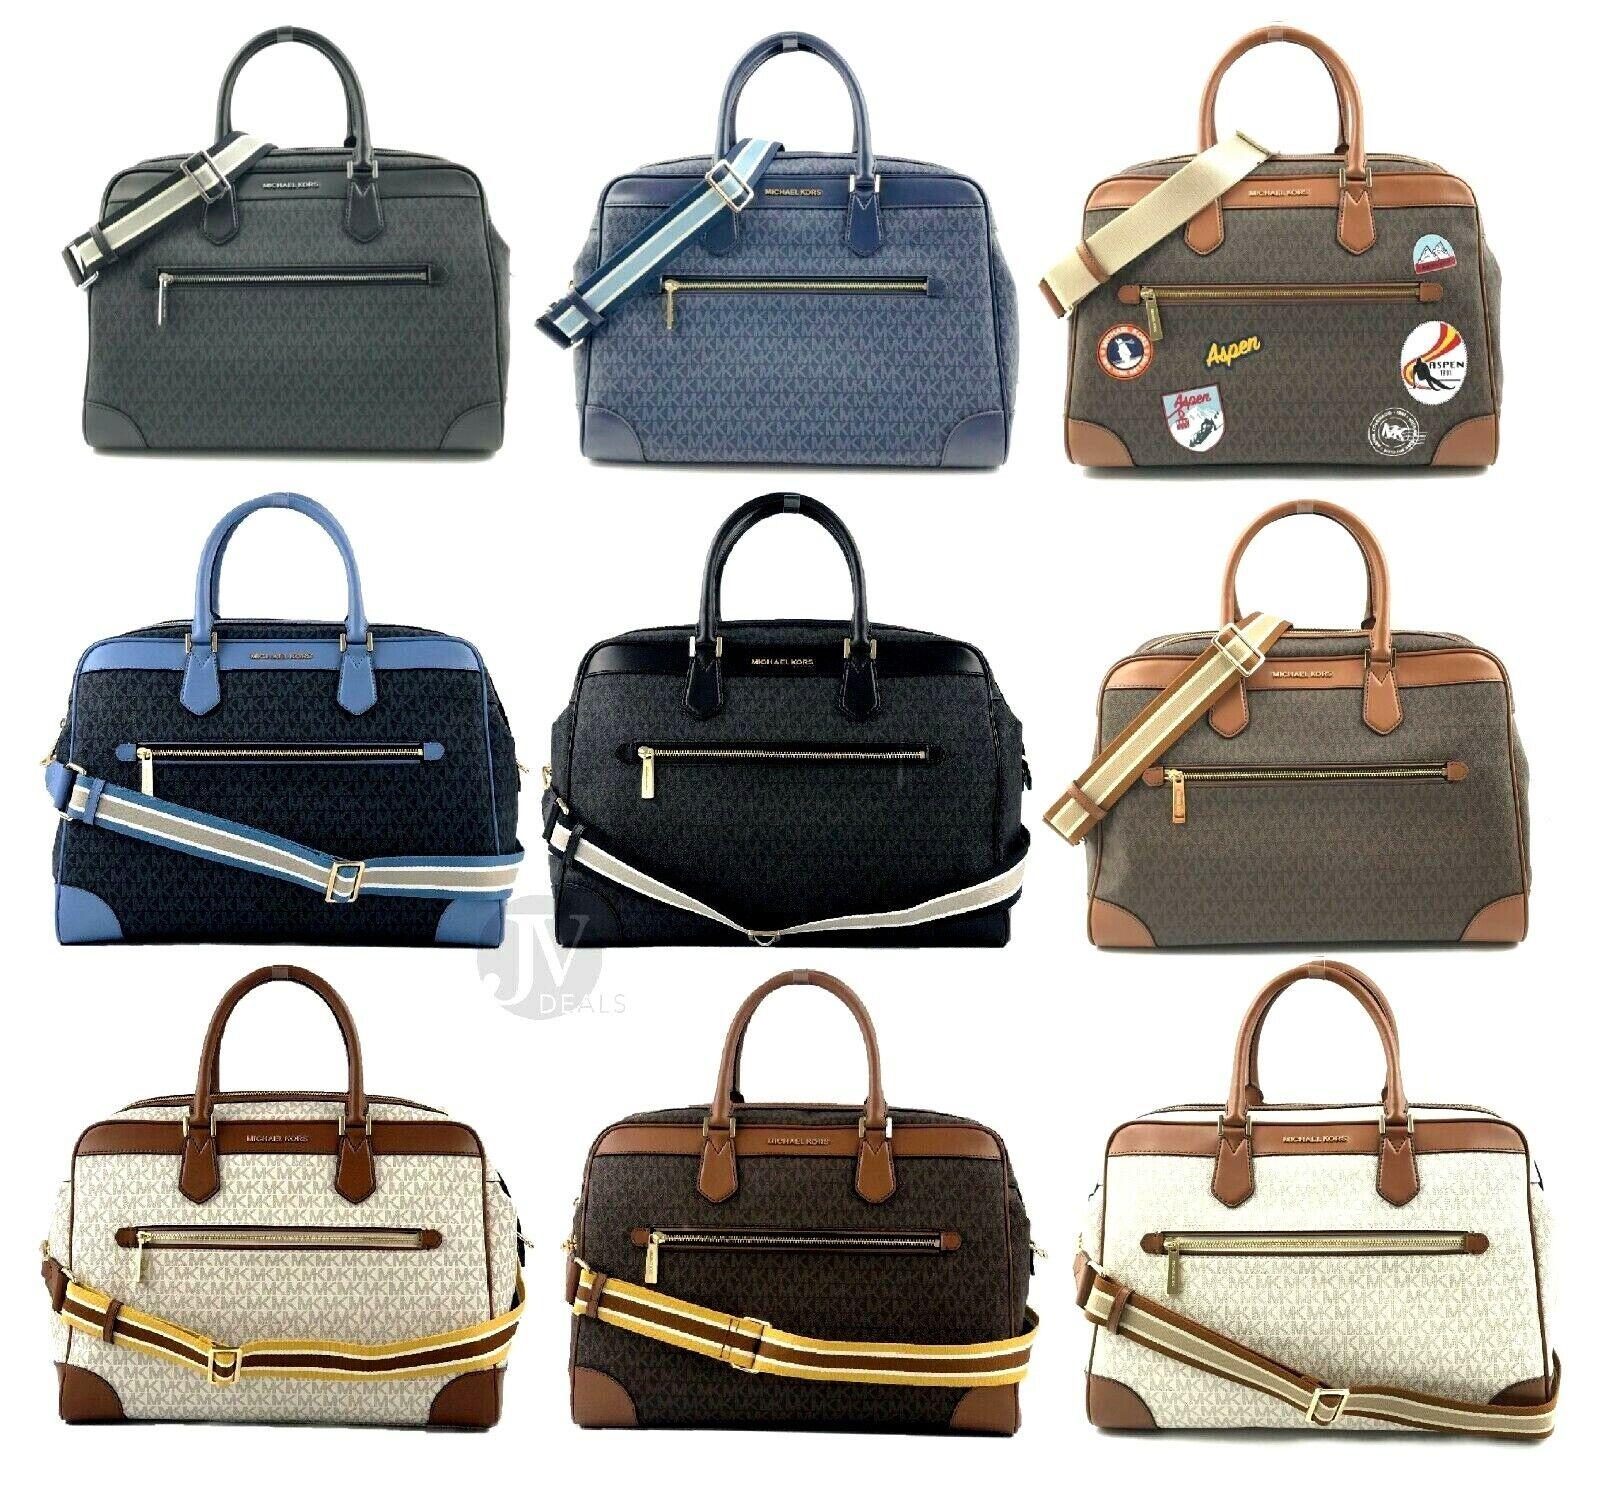 Michael Kors Jet Set Travel Signature PVC XL Weekender Duffle Carry On Bag